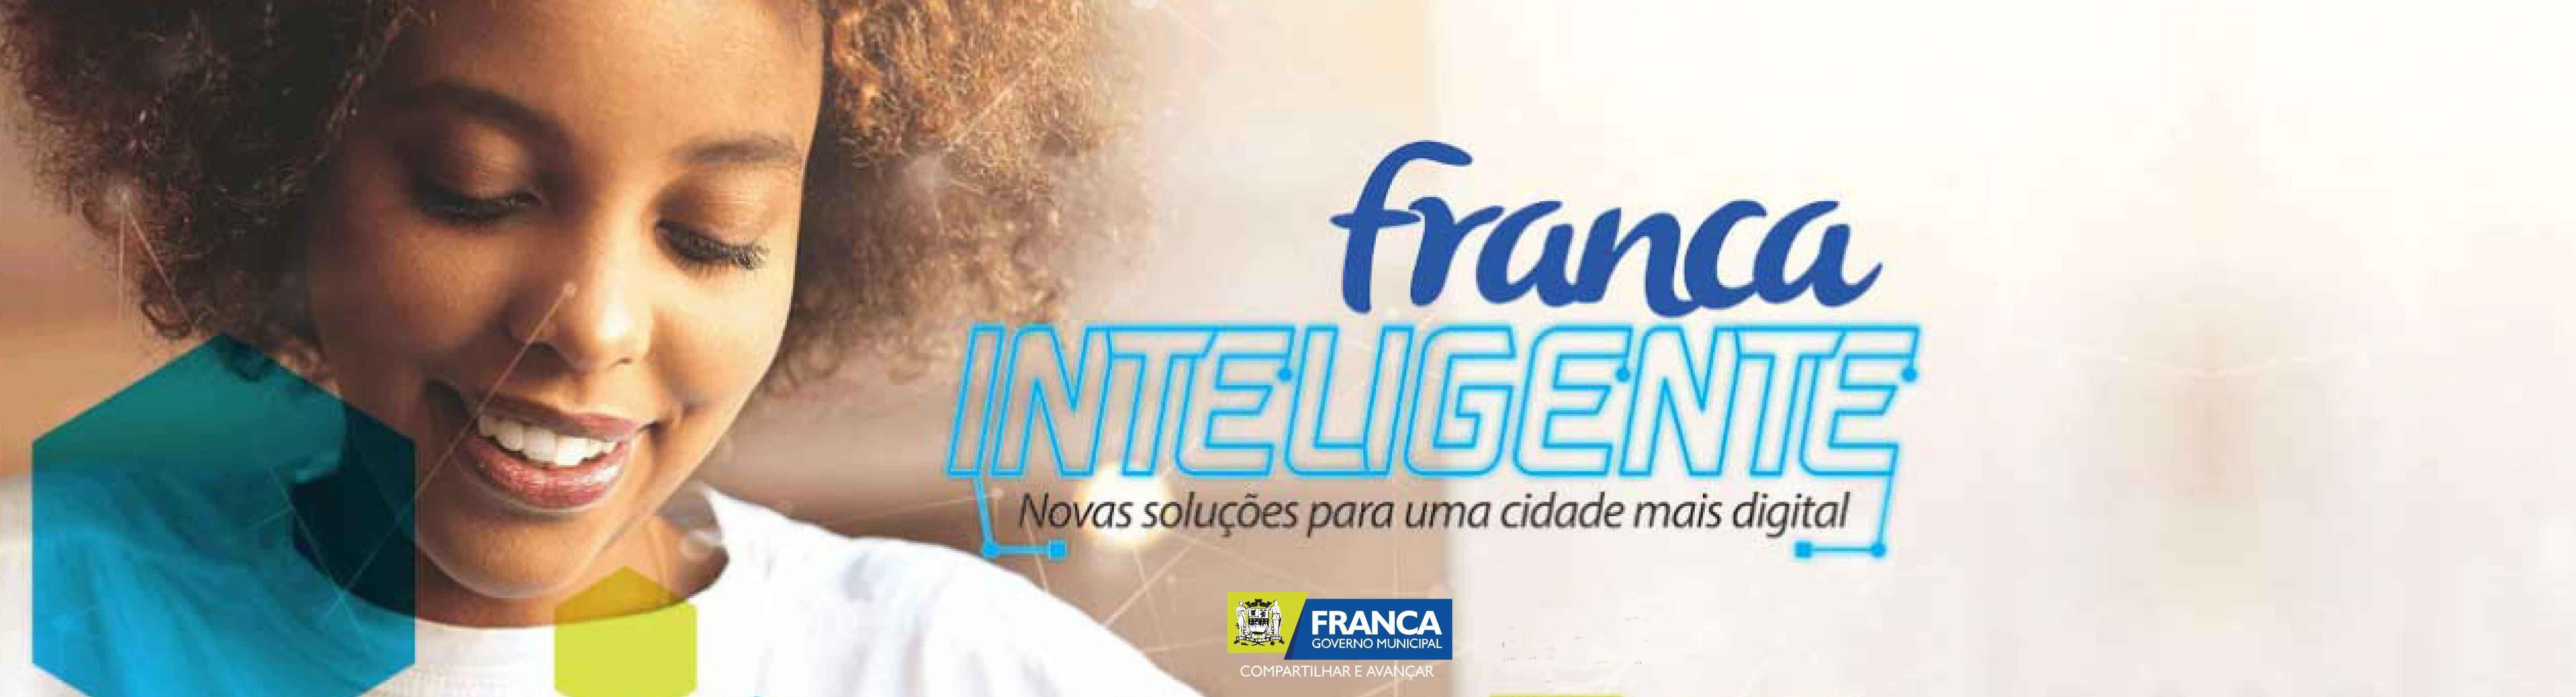 BANNER-FRANCA-INTELIGENTE-01